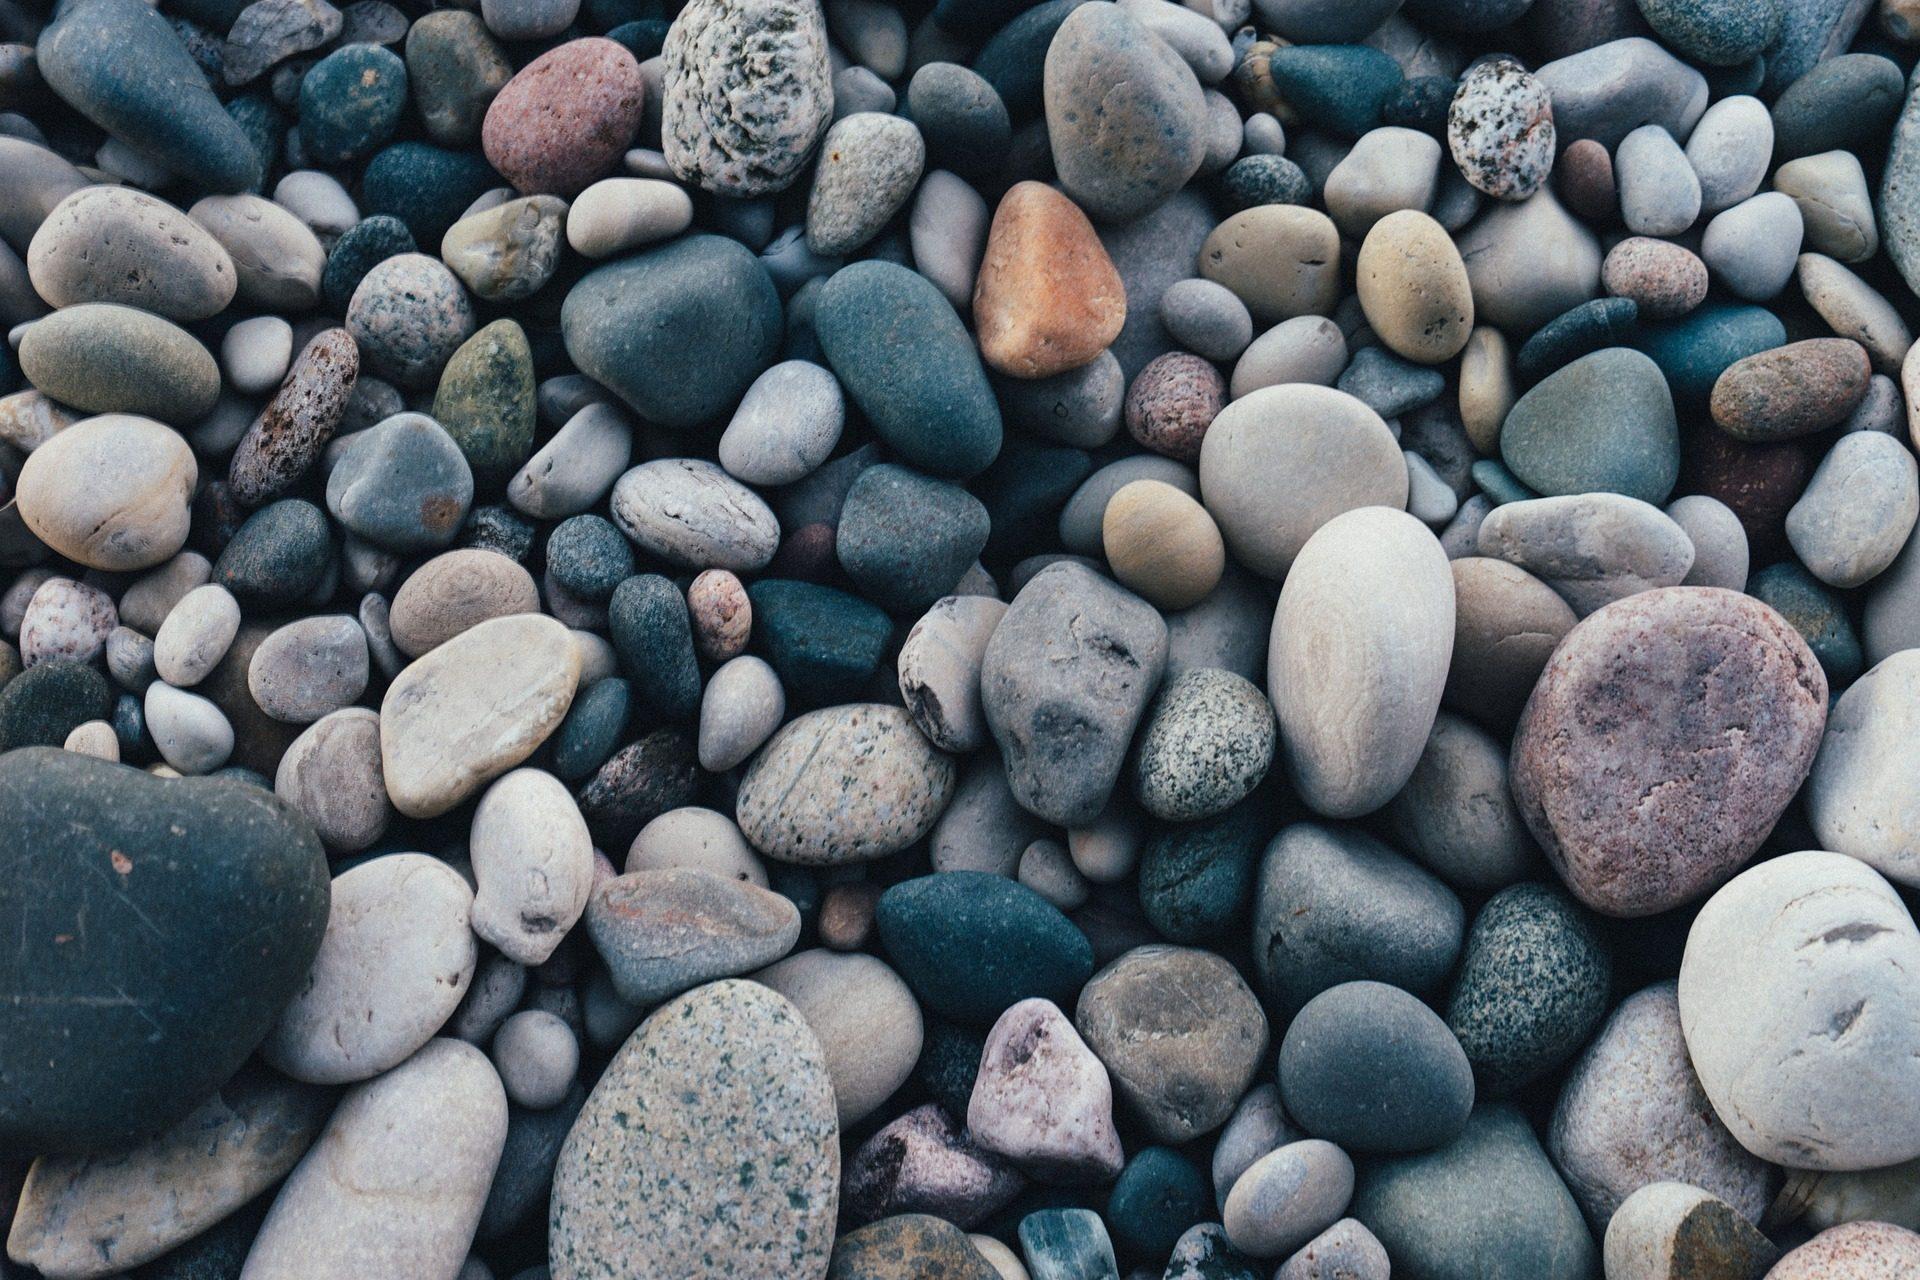 पत्थर, Rocas, विविधता, रंग, cantos - HD वॉलपेपर - प्रोफेसर-falken.com